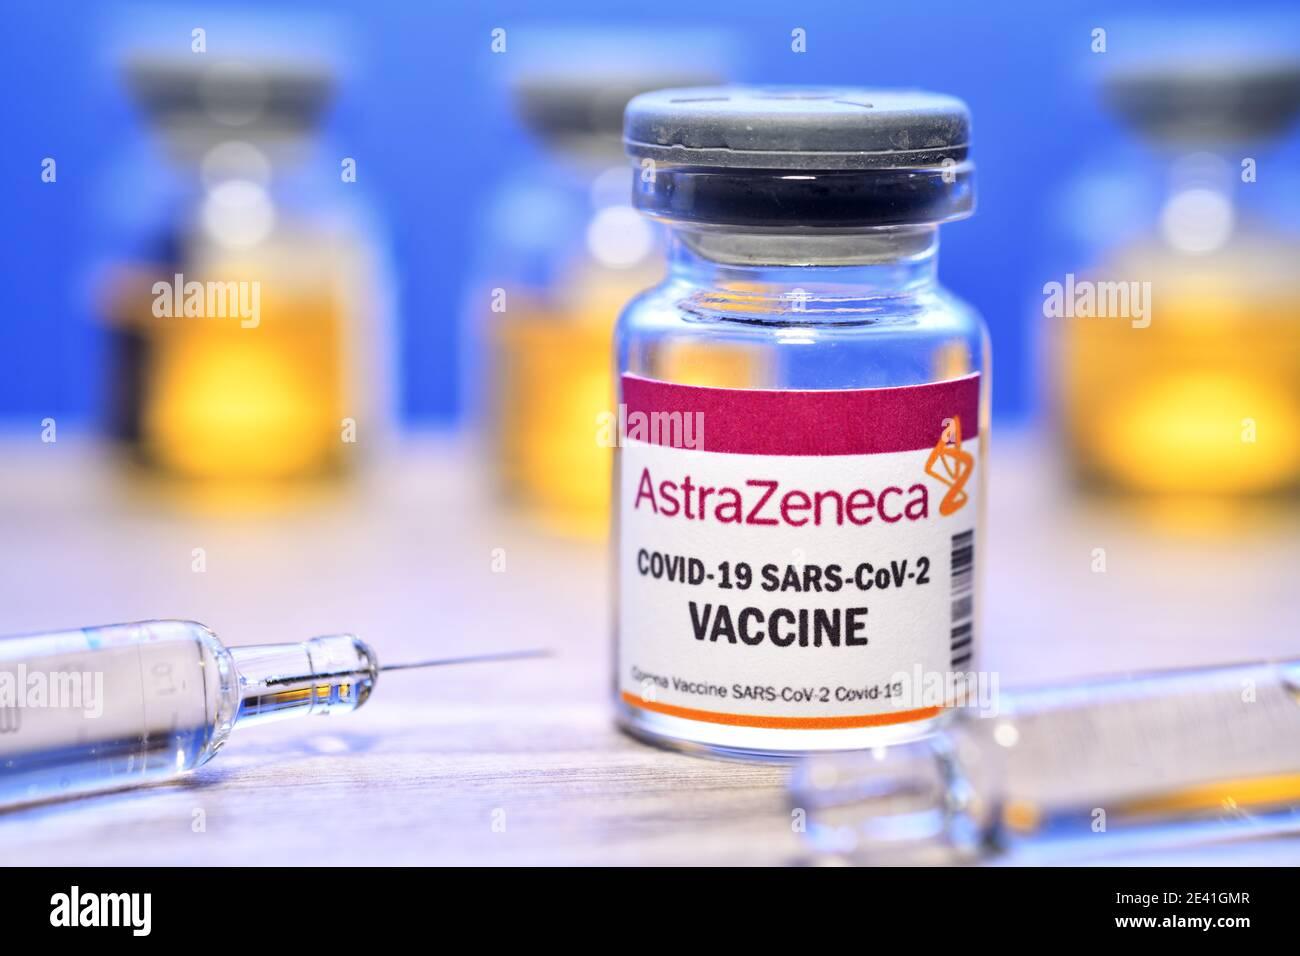 AstraZeneca Covid Vaccine, Symbolic Image Stock Photo